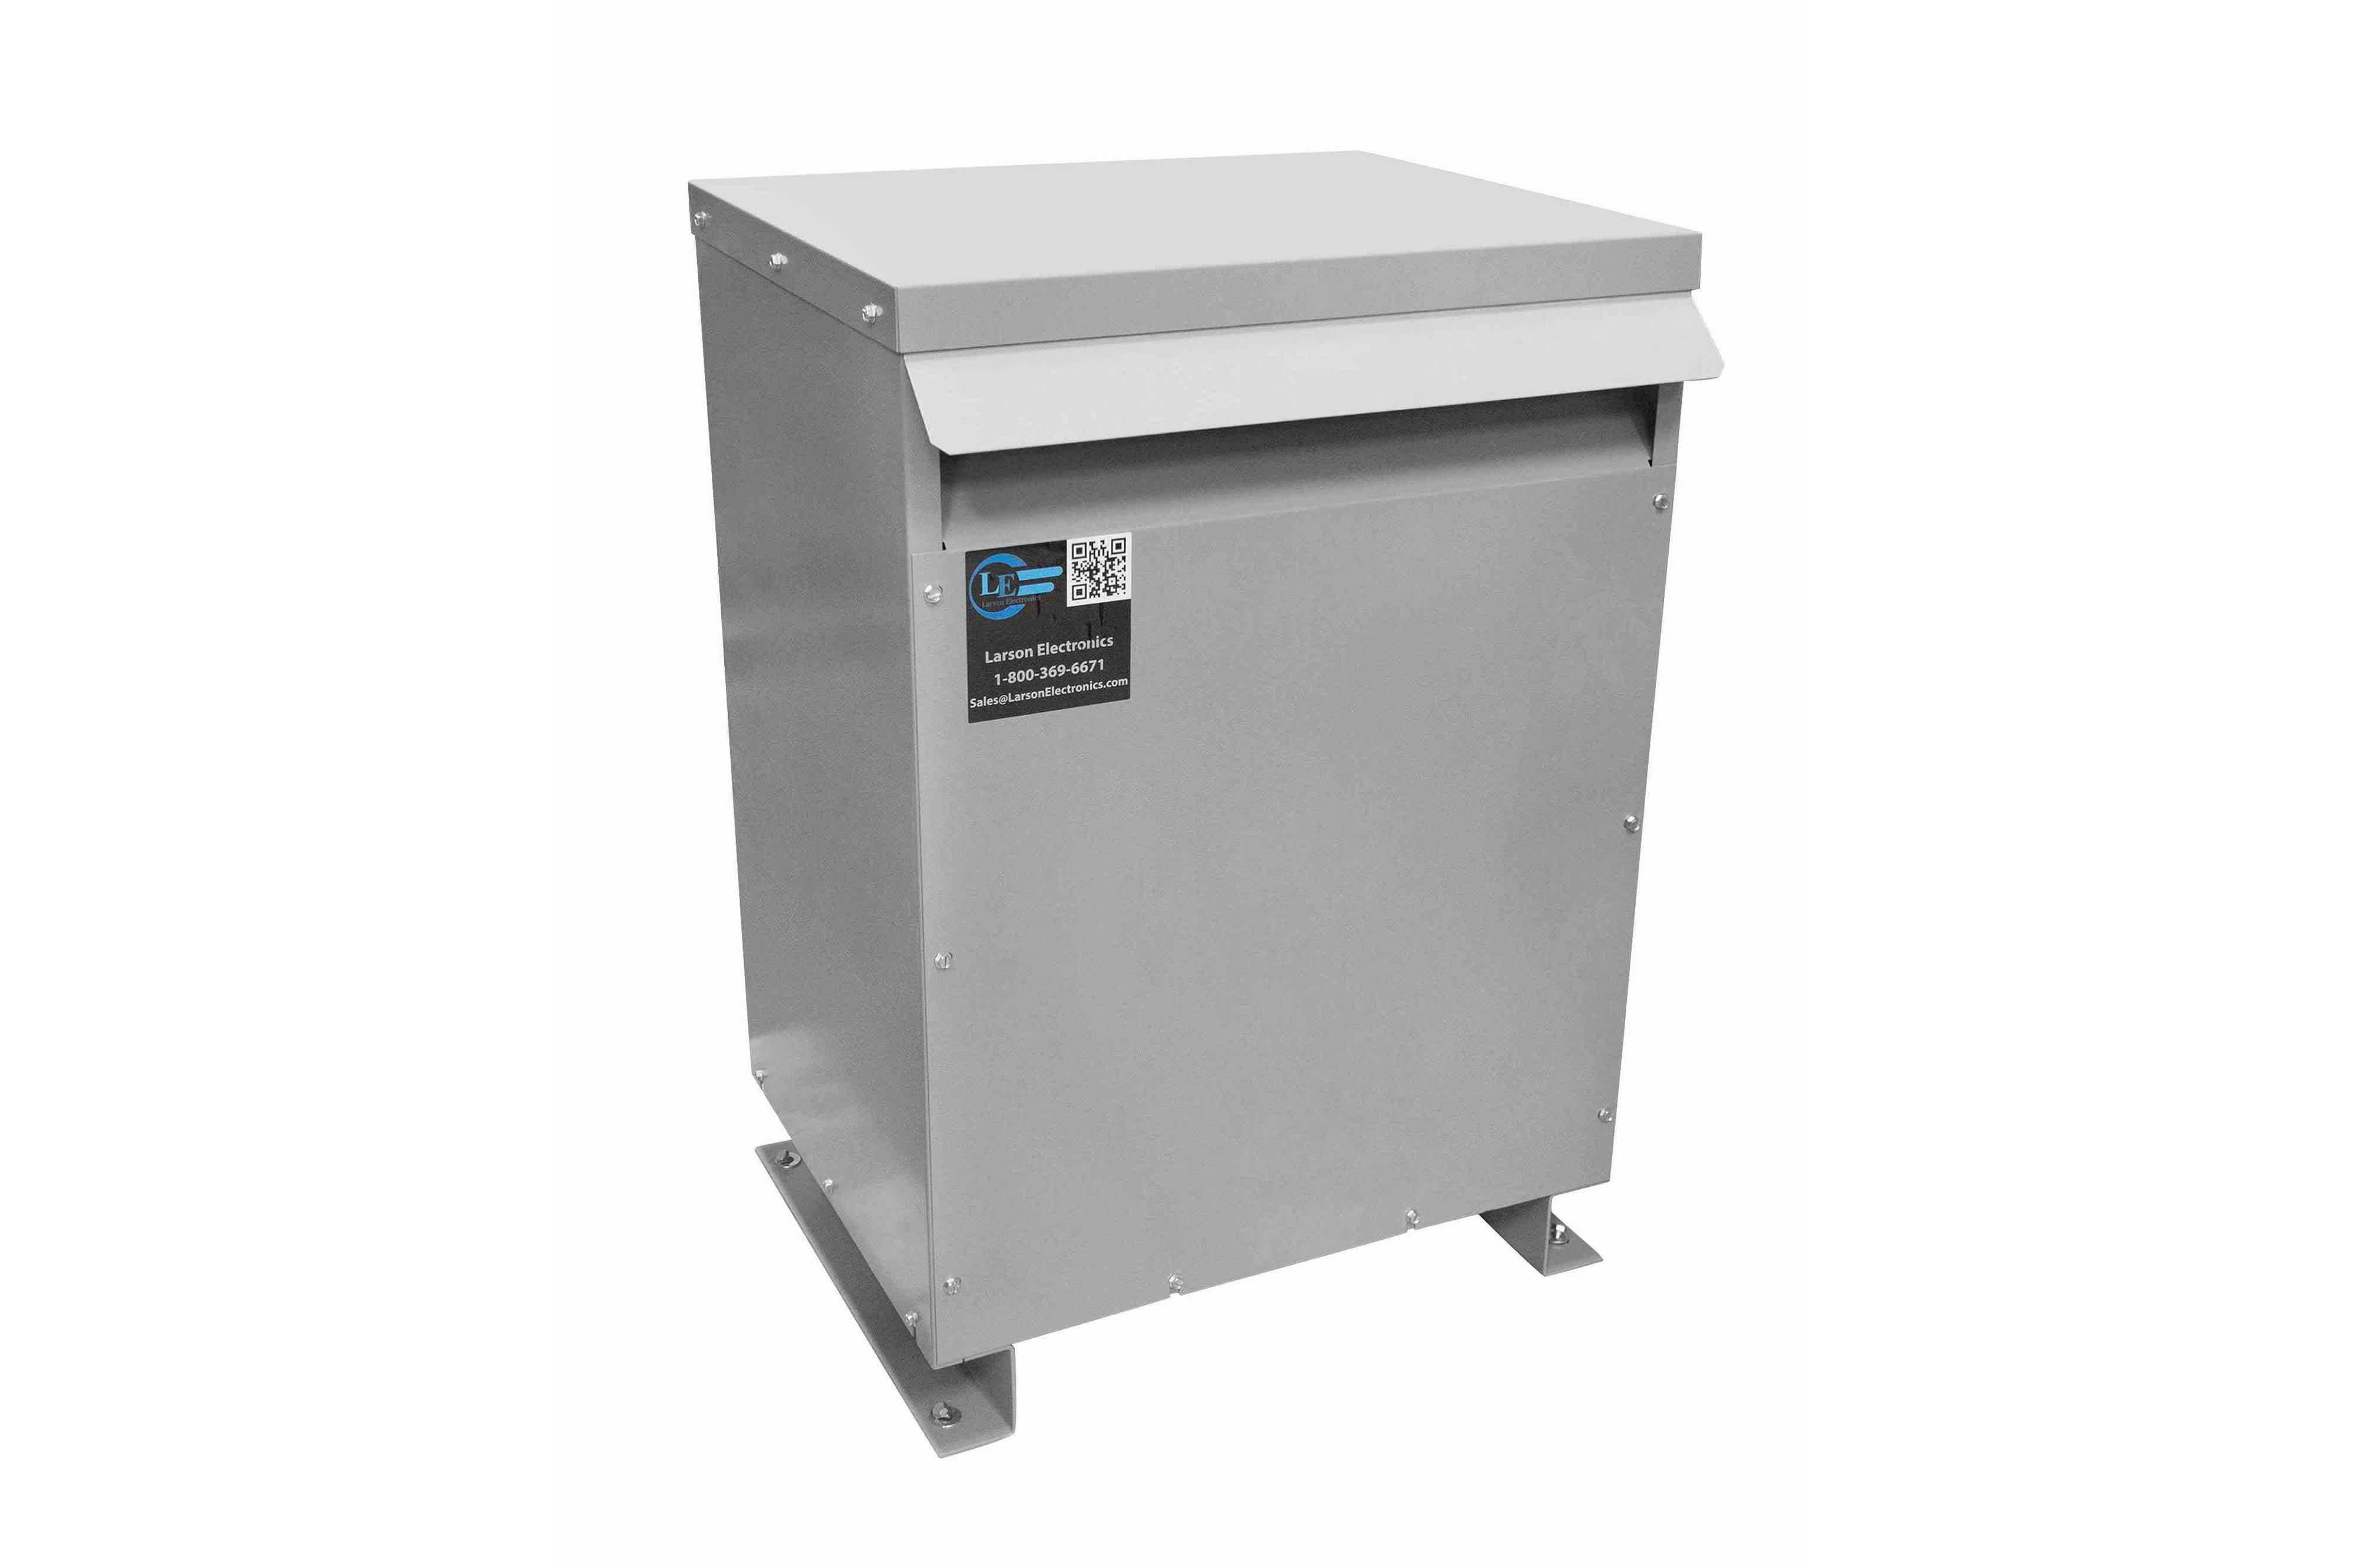 13 kVA 3PH Isolation Transformer, 600V Wye Primary, 240V Delta Secondary, N3R, Ventilated, 60 Hz